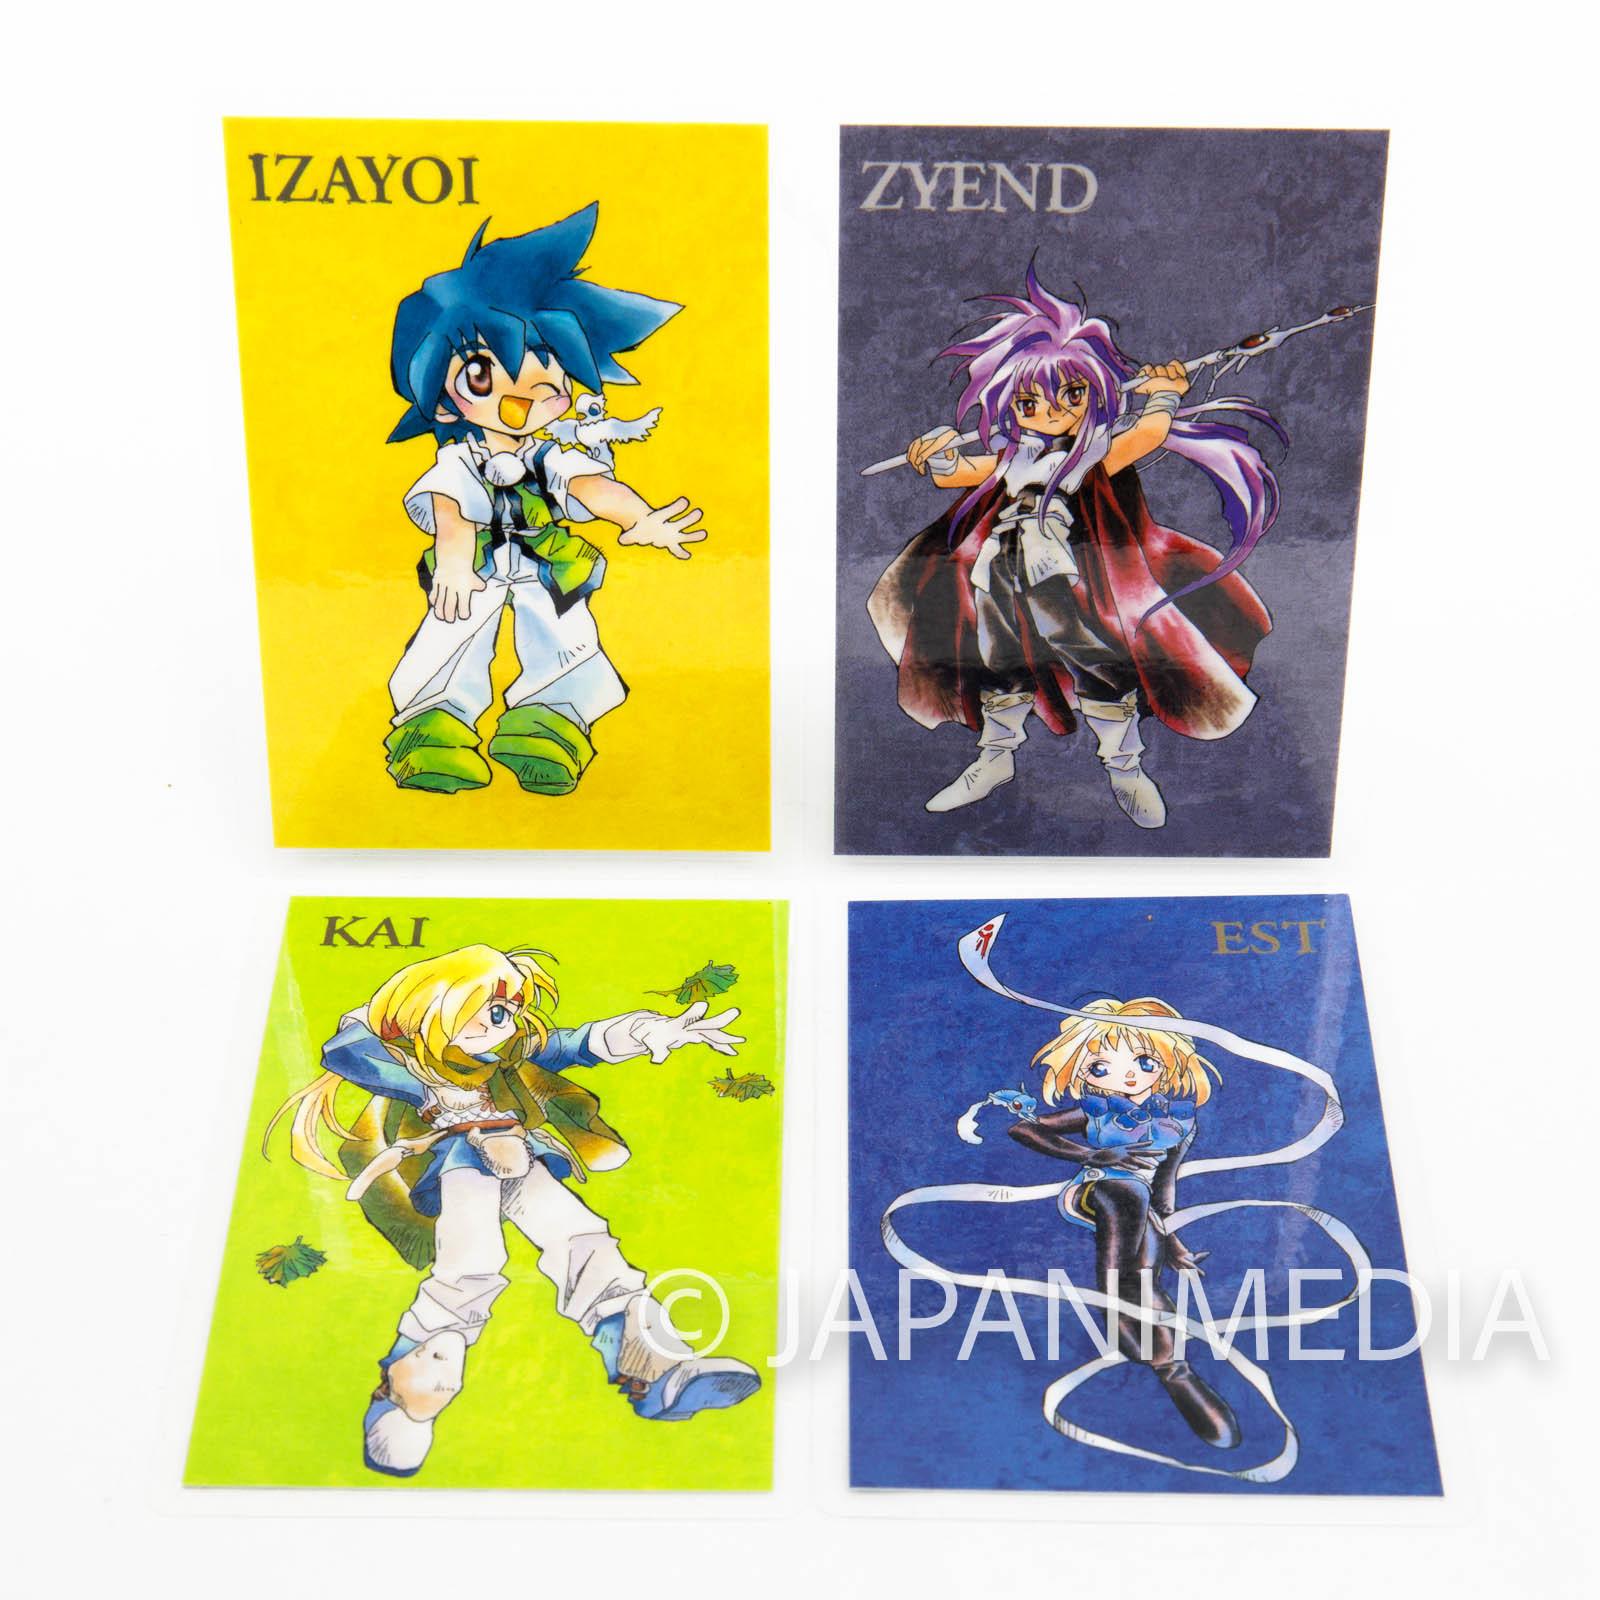 Toki no Daichi Laminate Card 4pc set [Izayoi | Zyend | Kai | EST] Miyuki Yama JAPAN MANGA